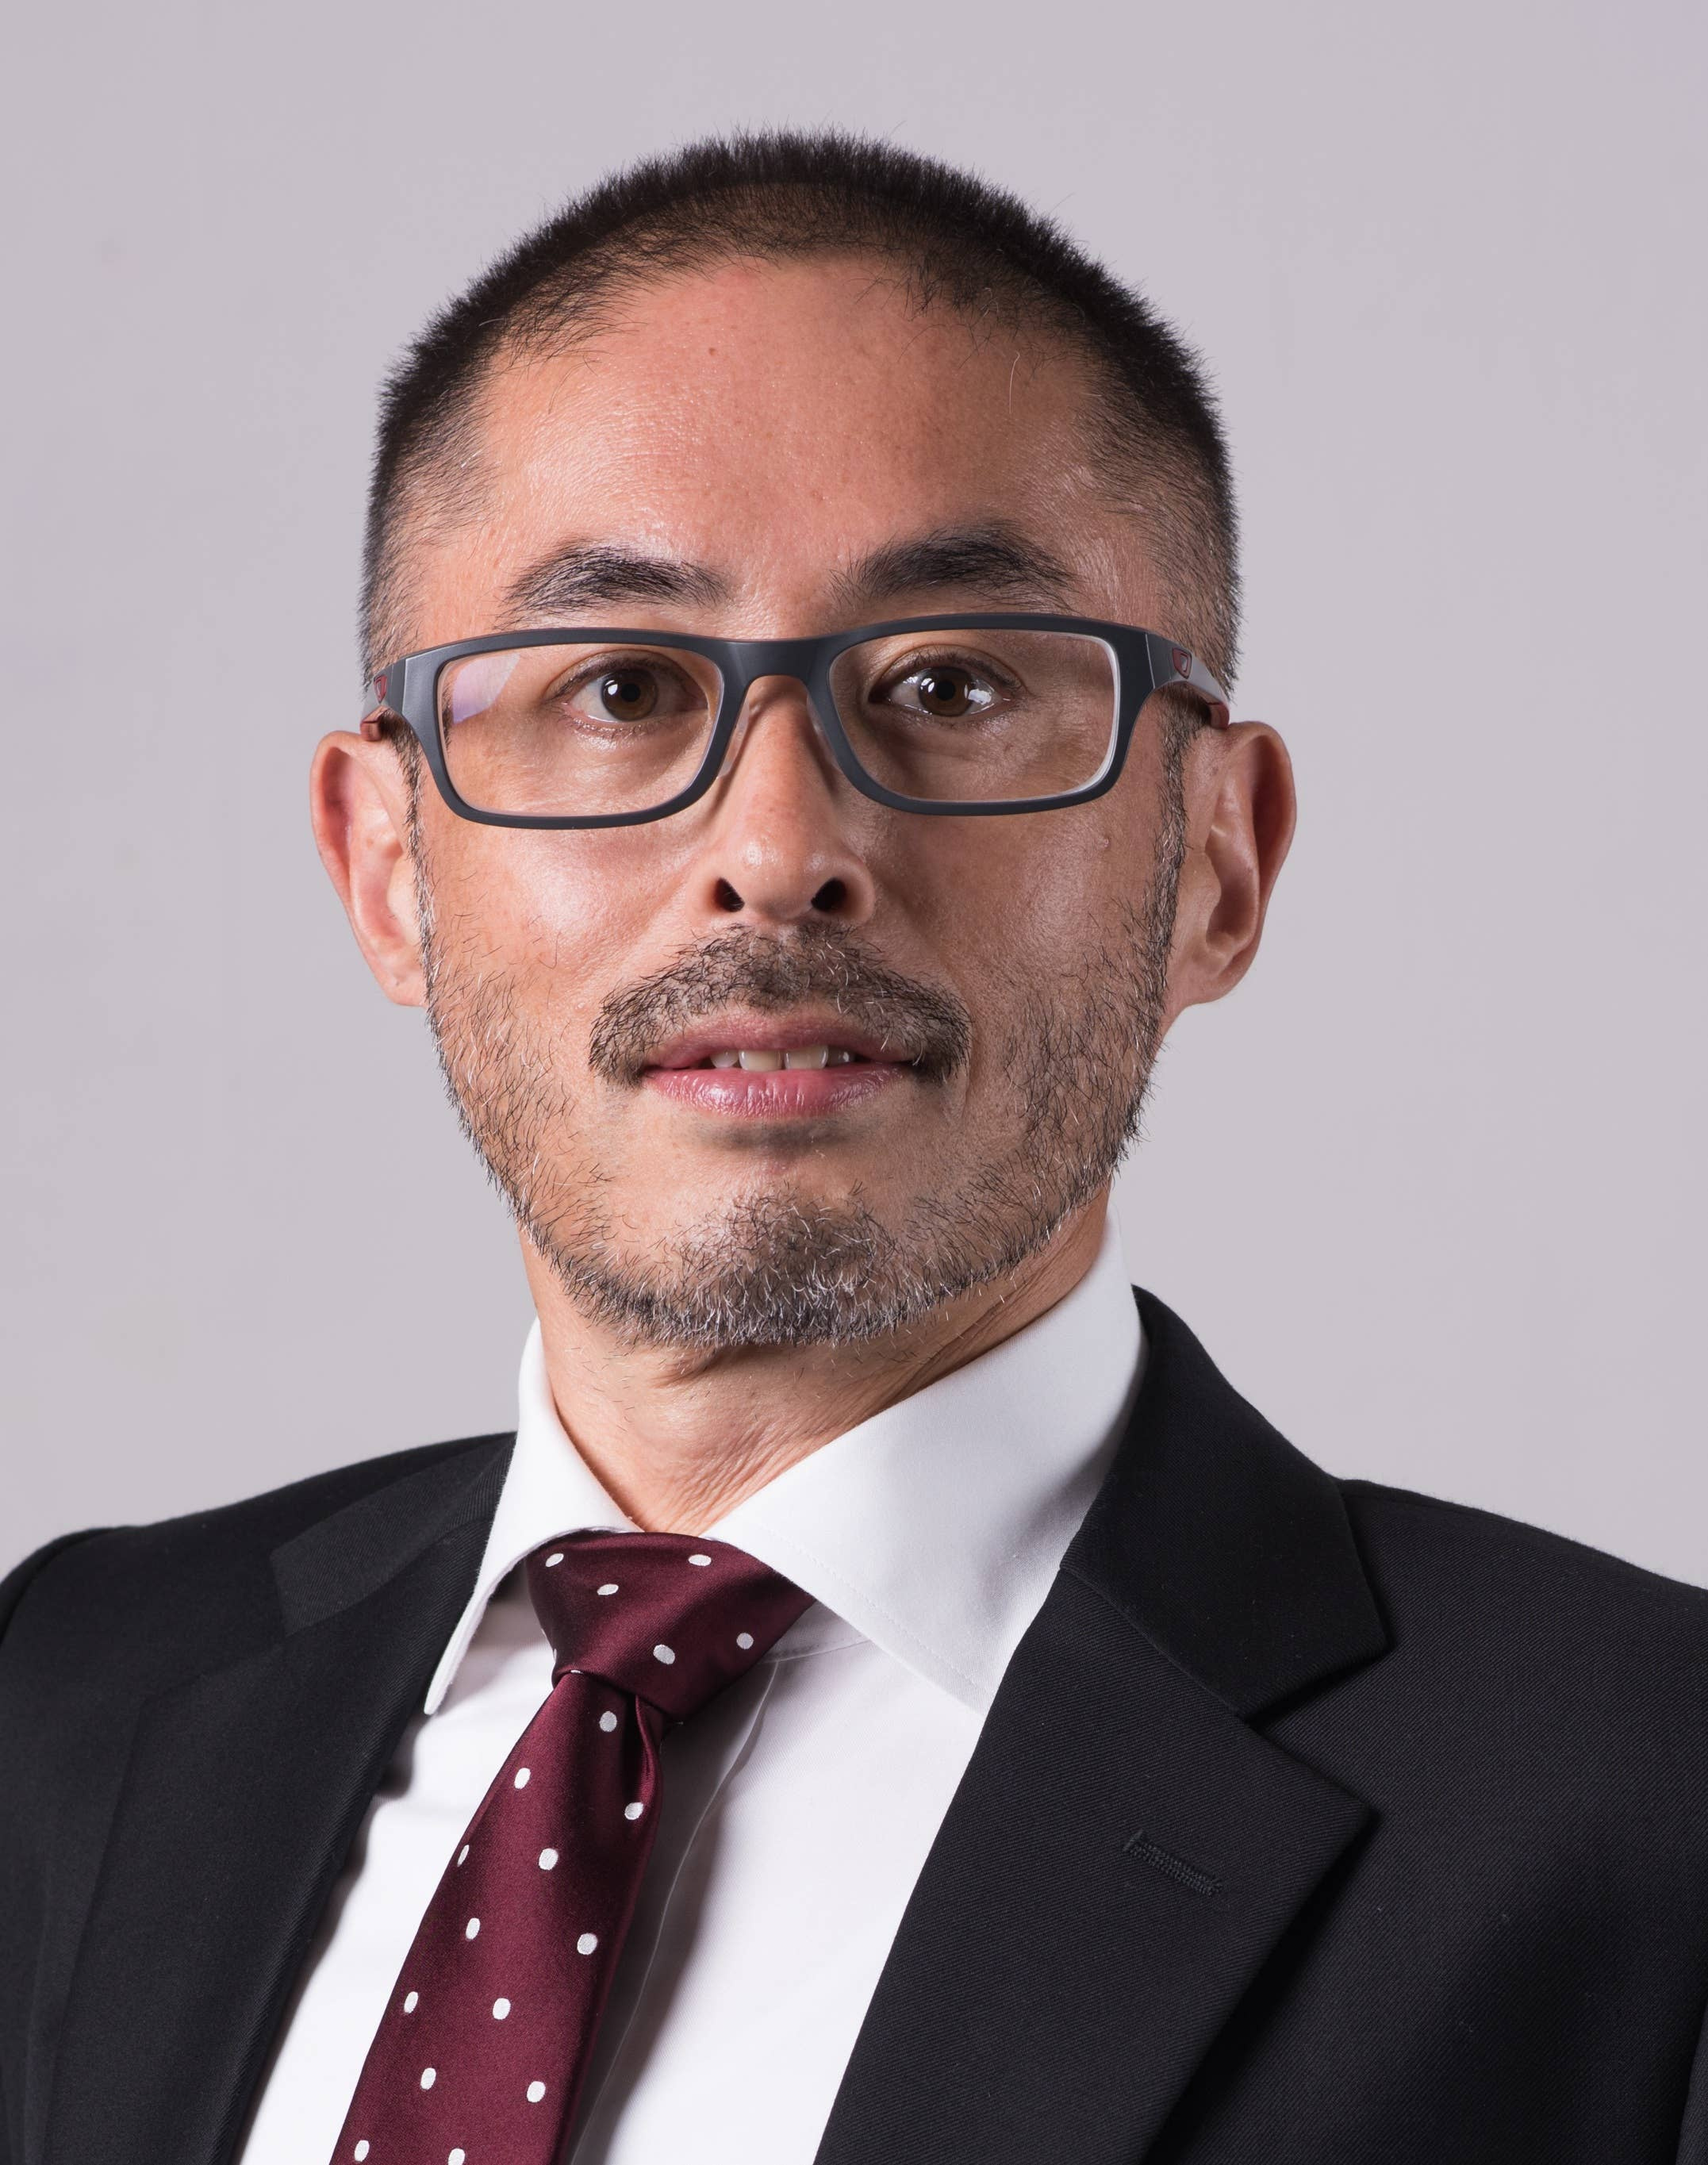 Koichiro Nagata